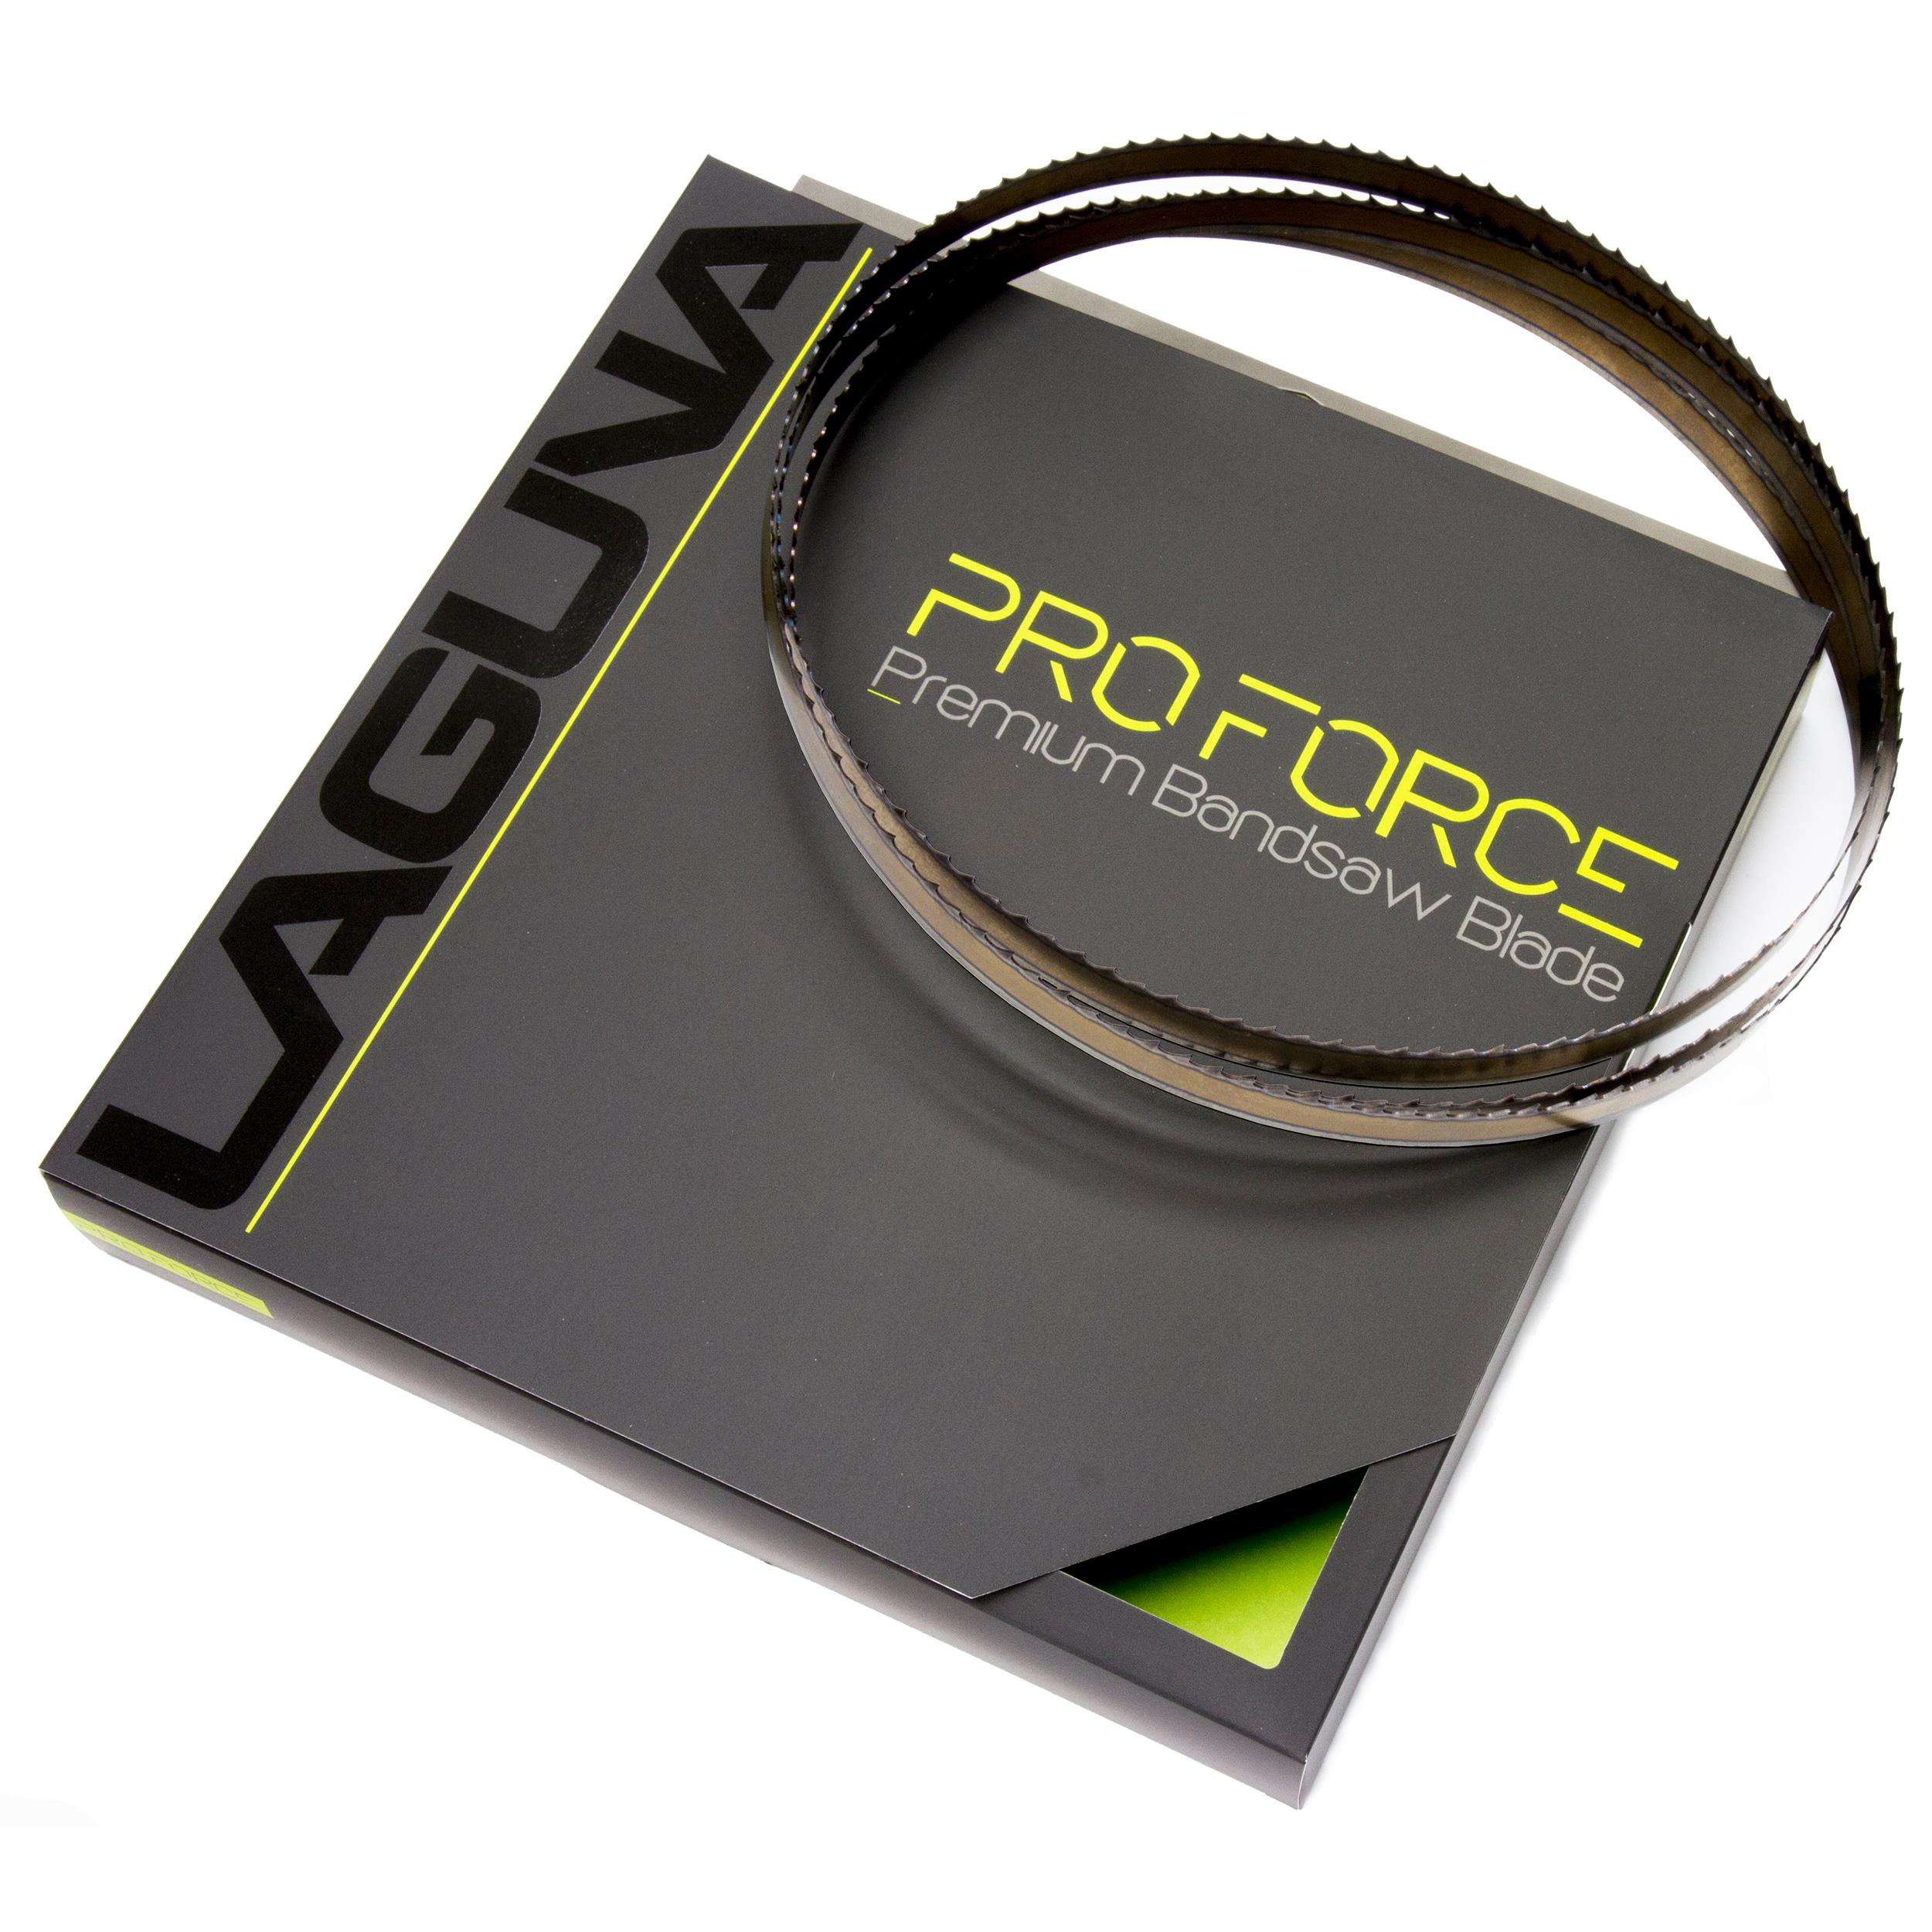 Pro Force 3 / 16